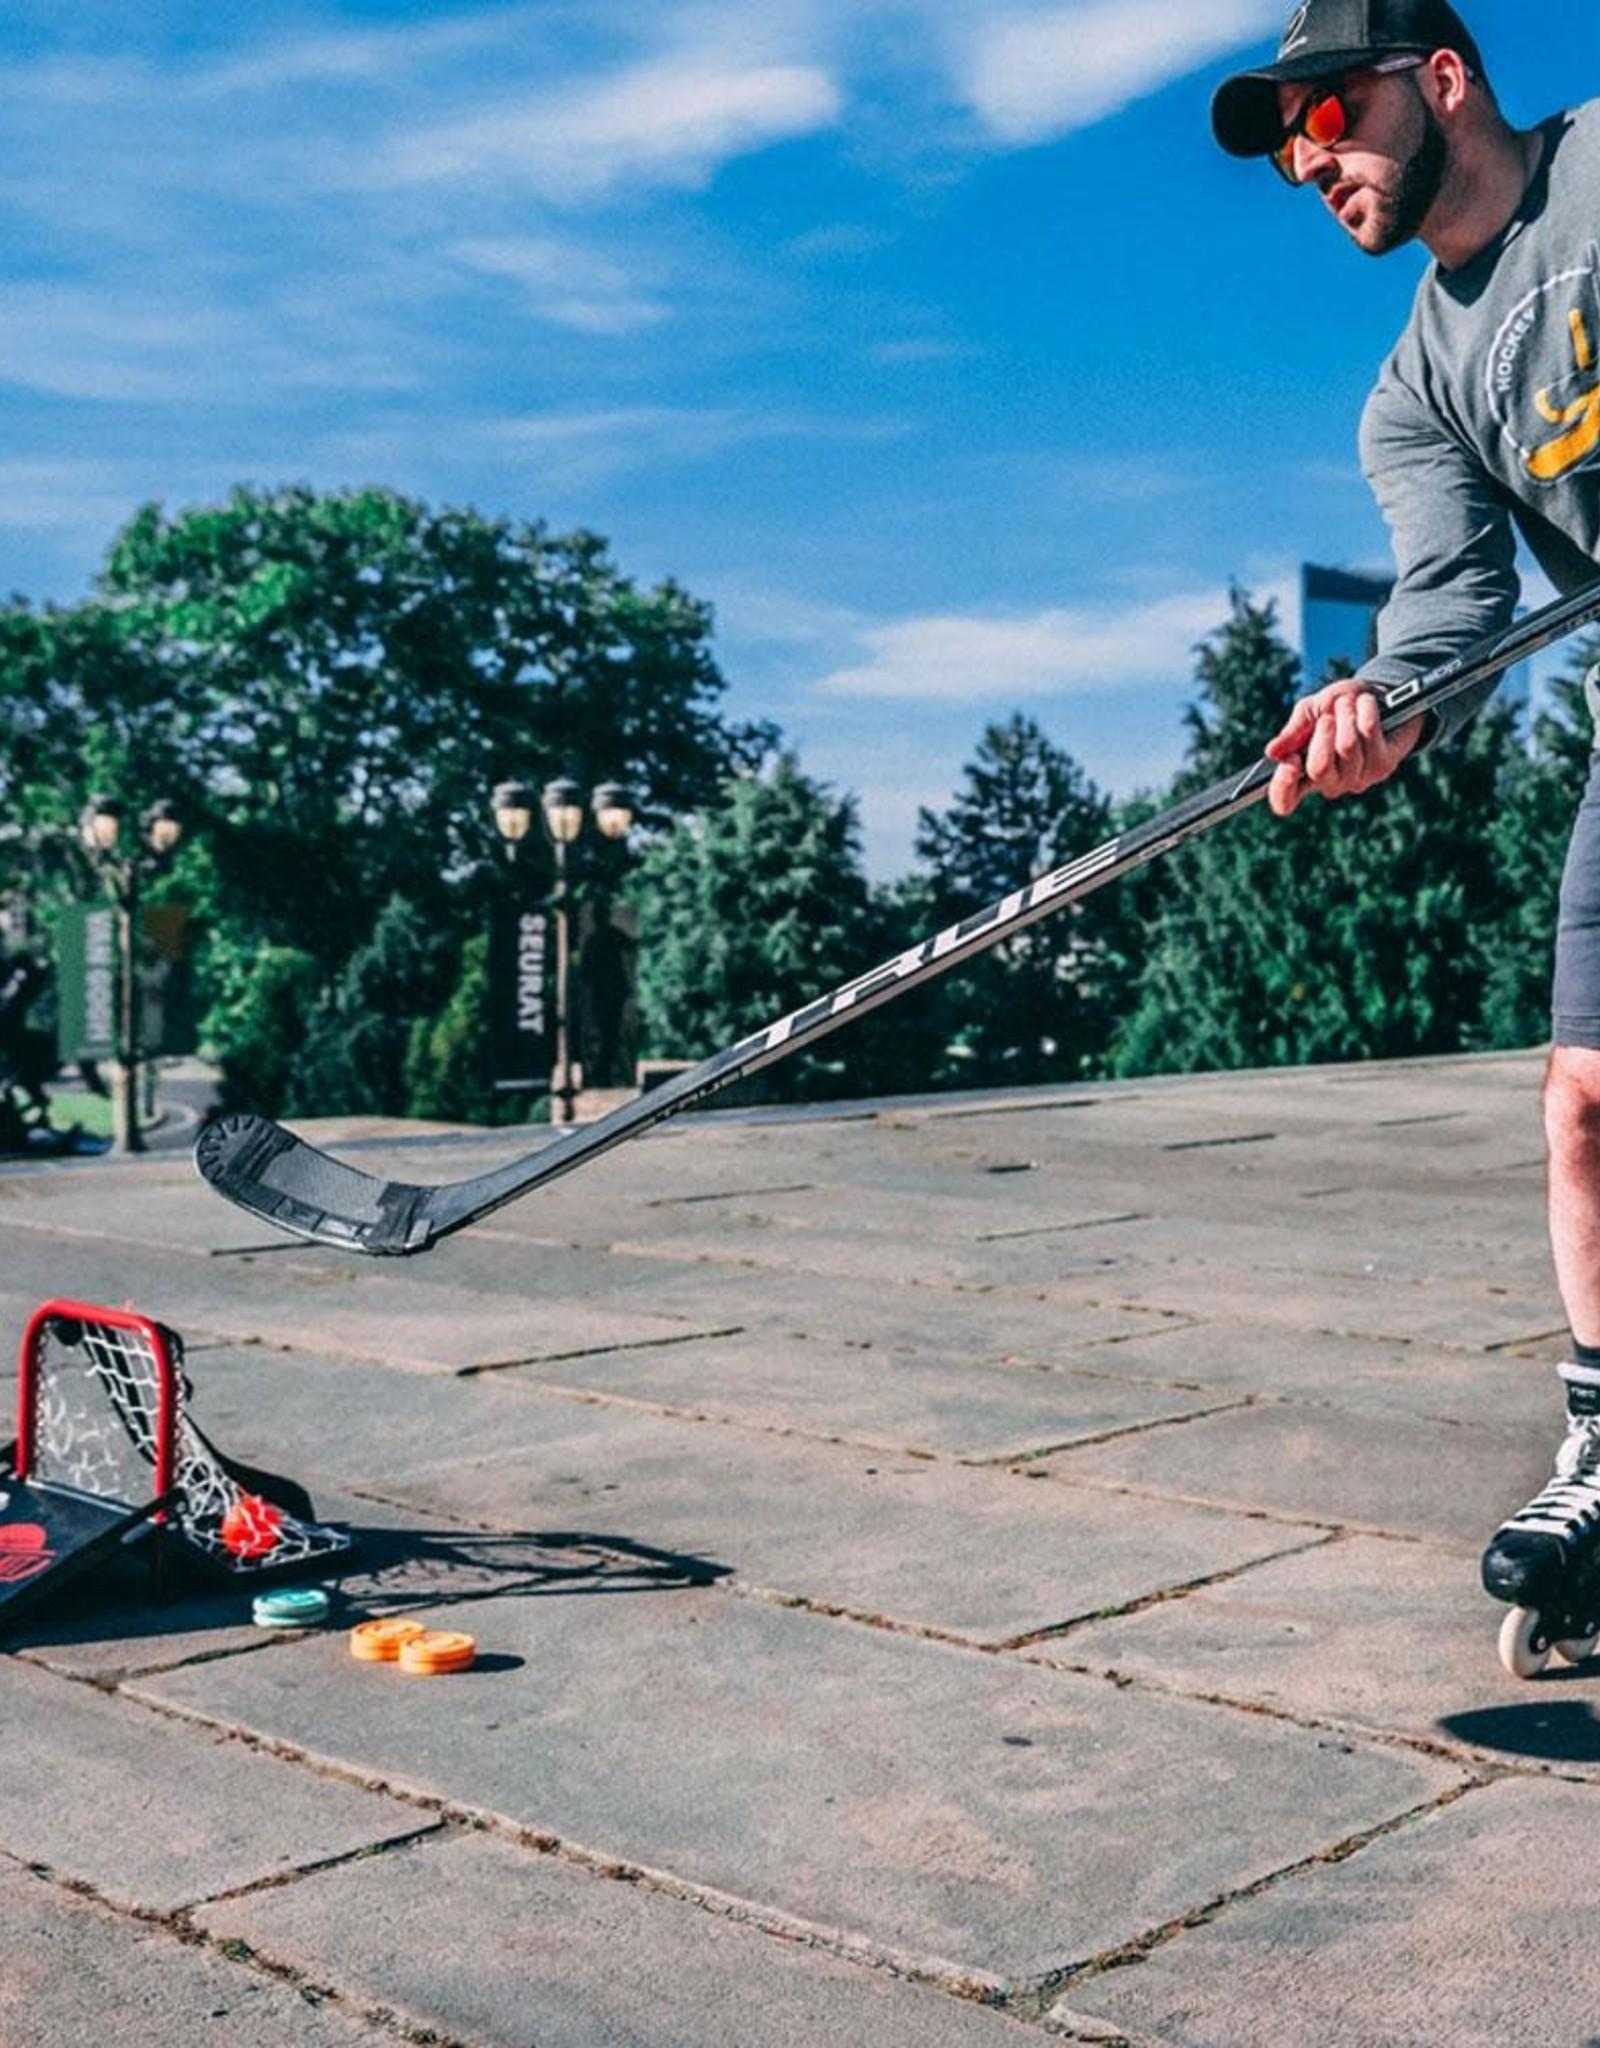 Wraparound Hockey Wraparound (BLACK)